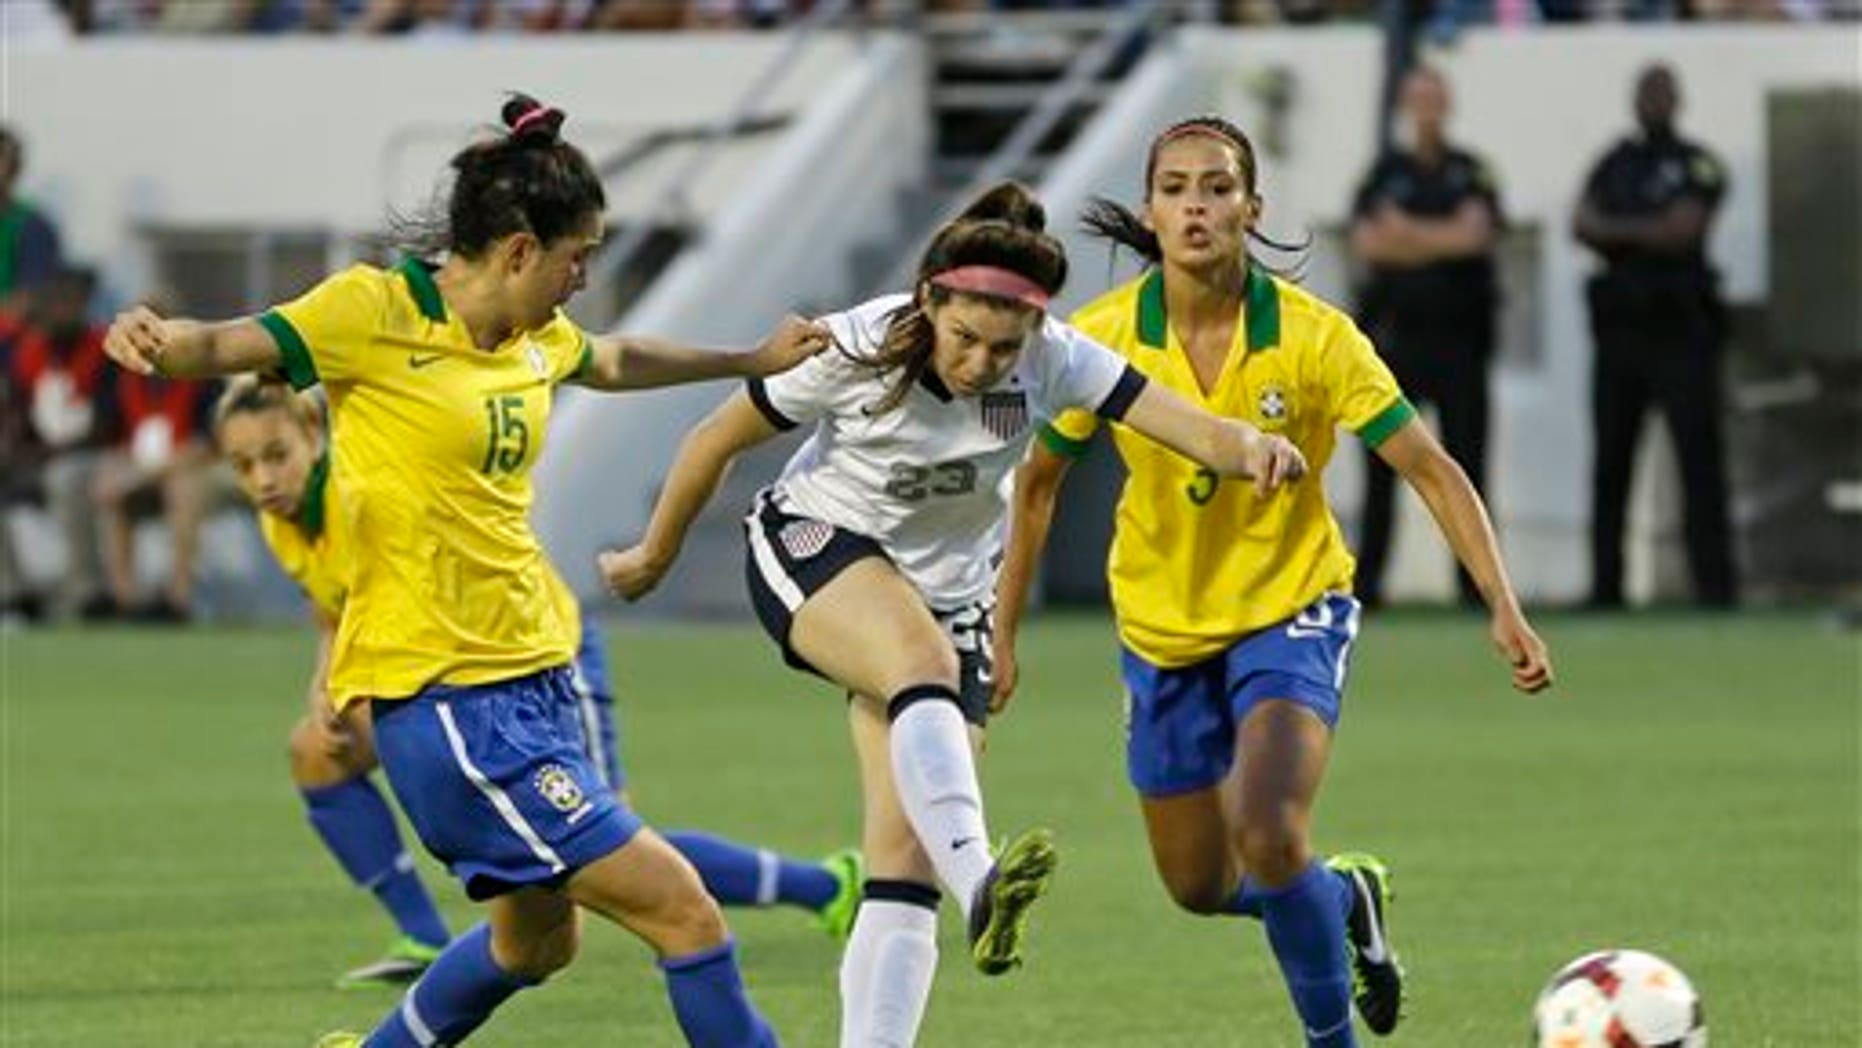 U.S. midfielder Erika Tymrak, center, scores a goal between Brazil midfielder Bia (15) and defender Calandrini (3) during the second half of an international friendly soccer match in Orlando, Fla., Sunday, Nov. 10, 2013. United States Women's national team defeated Brazil 4-1. (AP Photo/John Raoux)